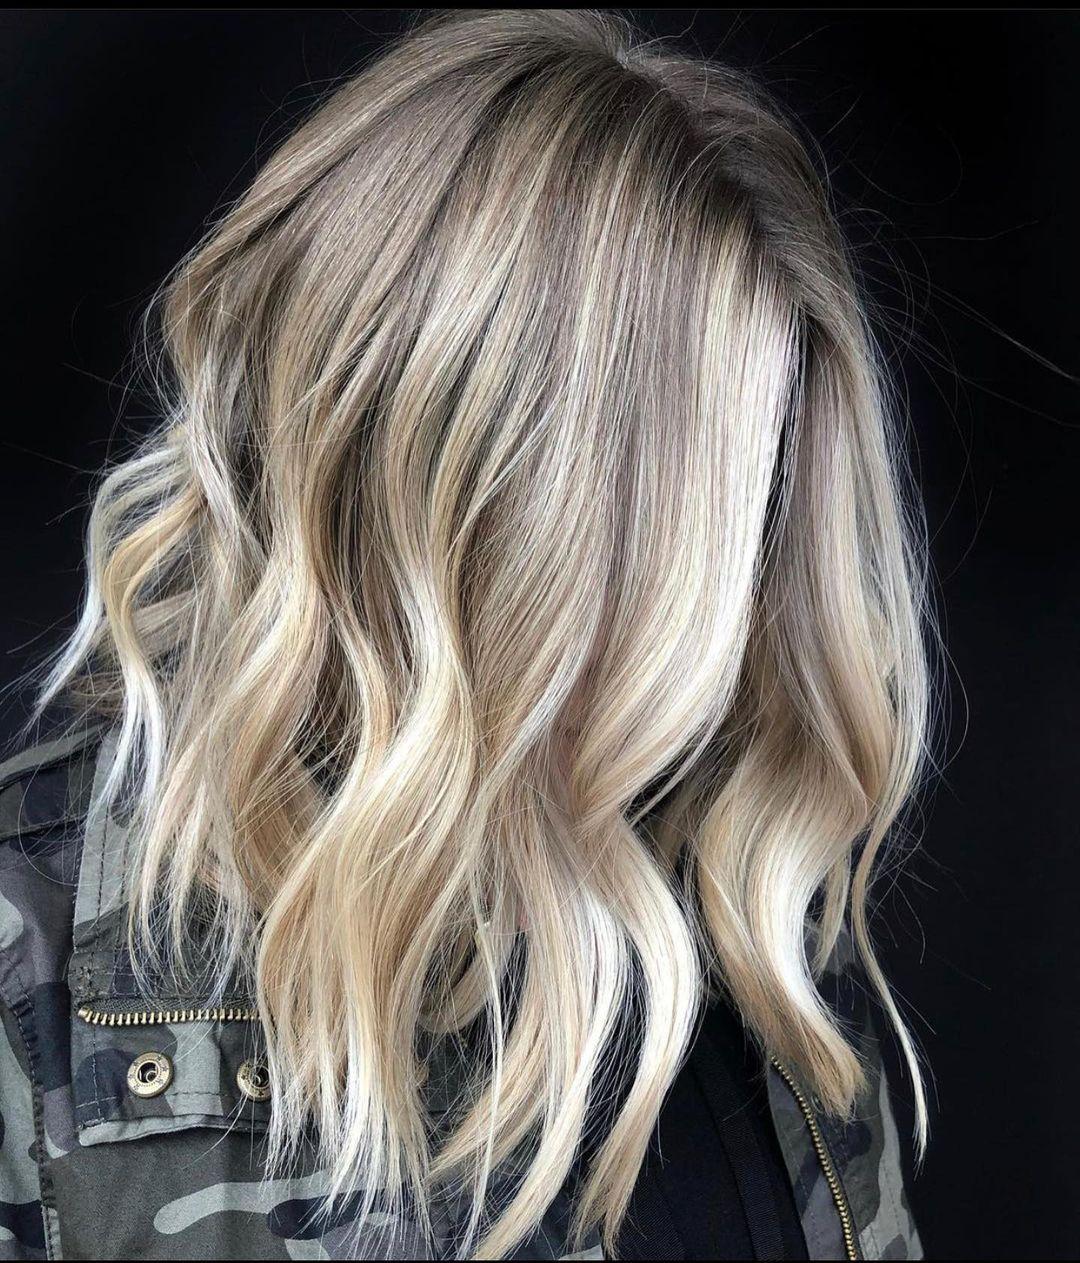 Voluminous Lob with Blonde Highlights